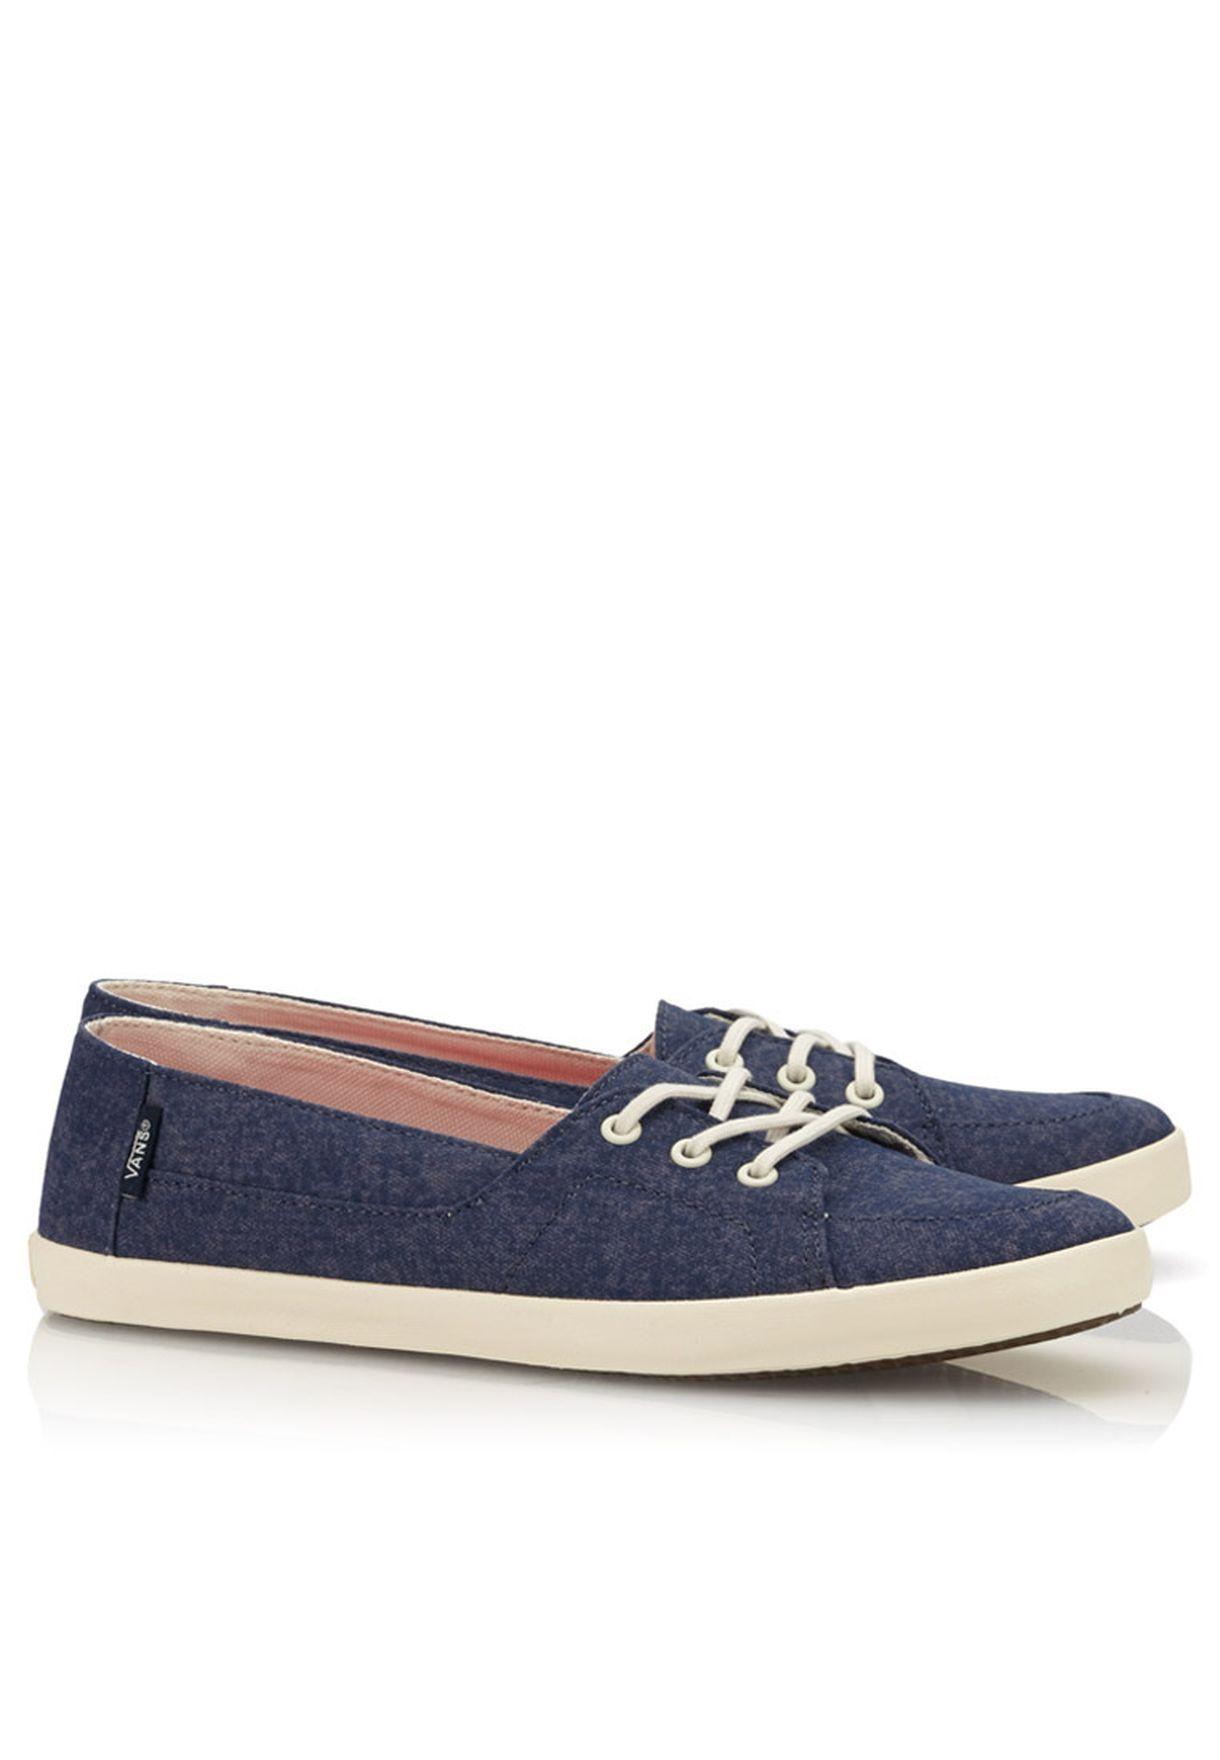 47092a0cf8 Shop Vans blue Palisades Vulc Calypso Sneakers for Women in Qatar -  VA088SH98NLX